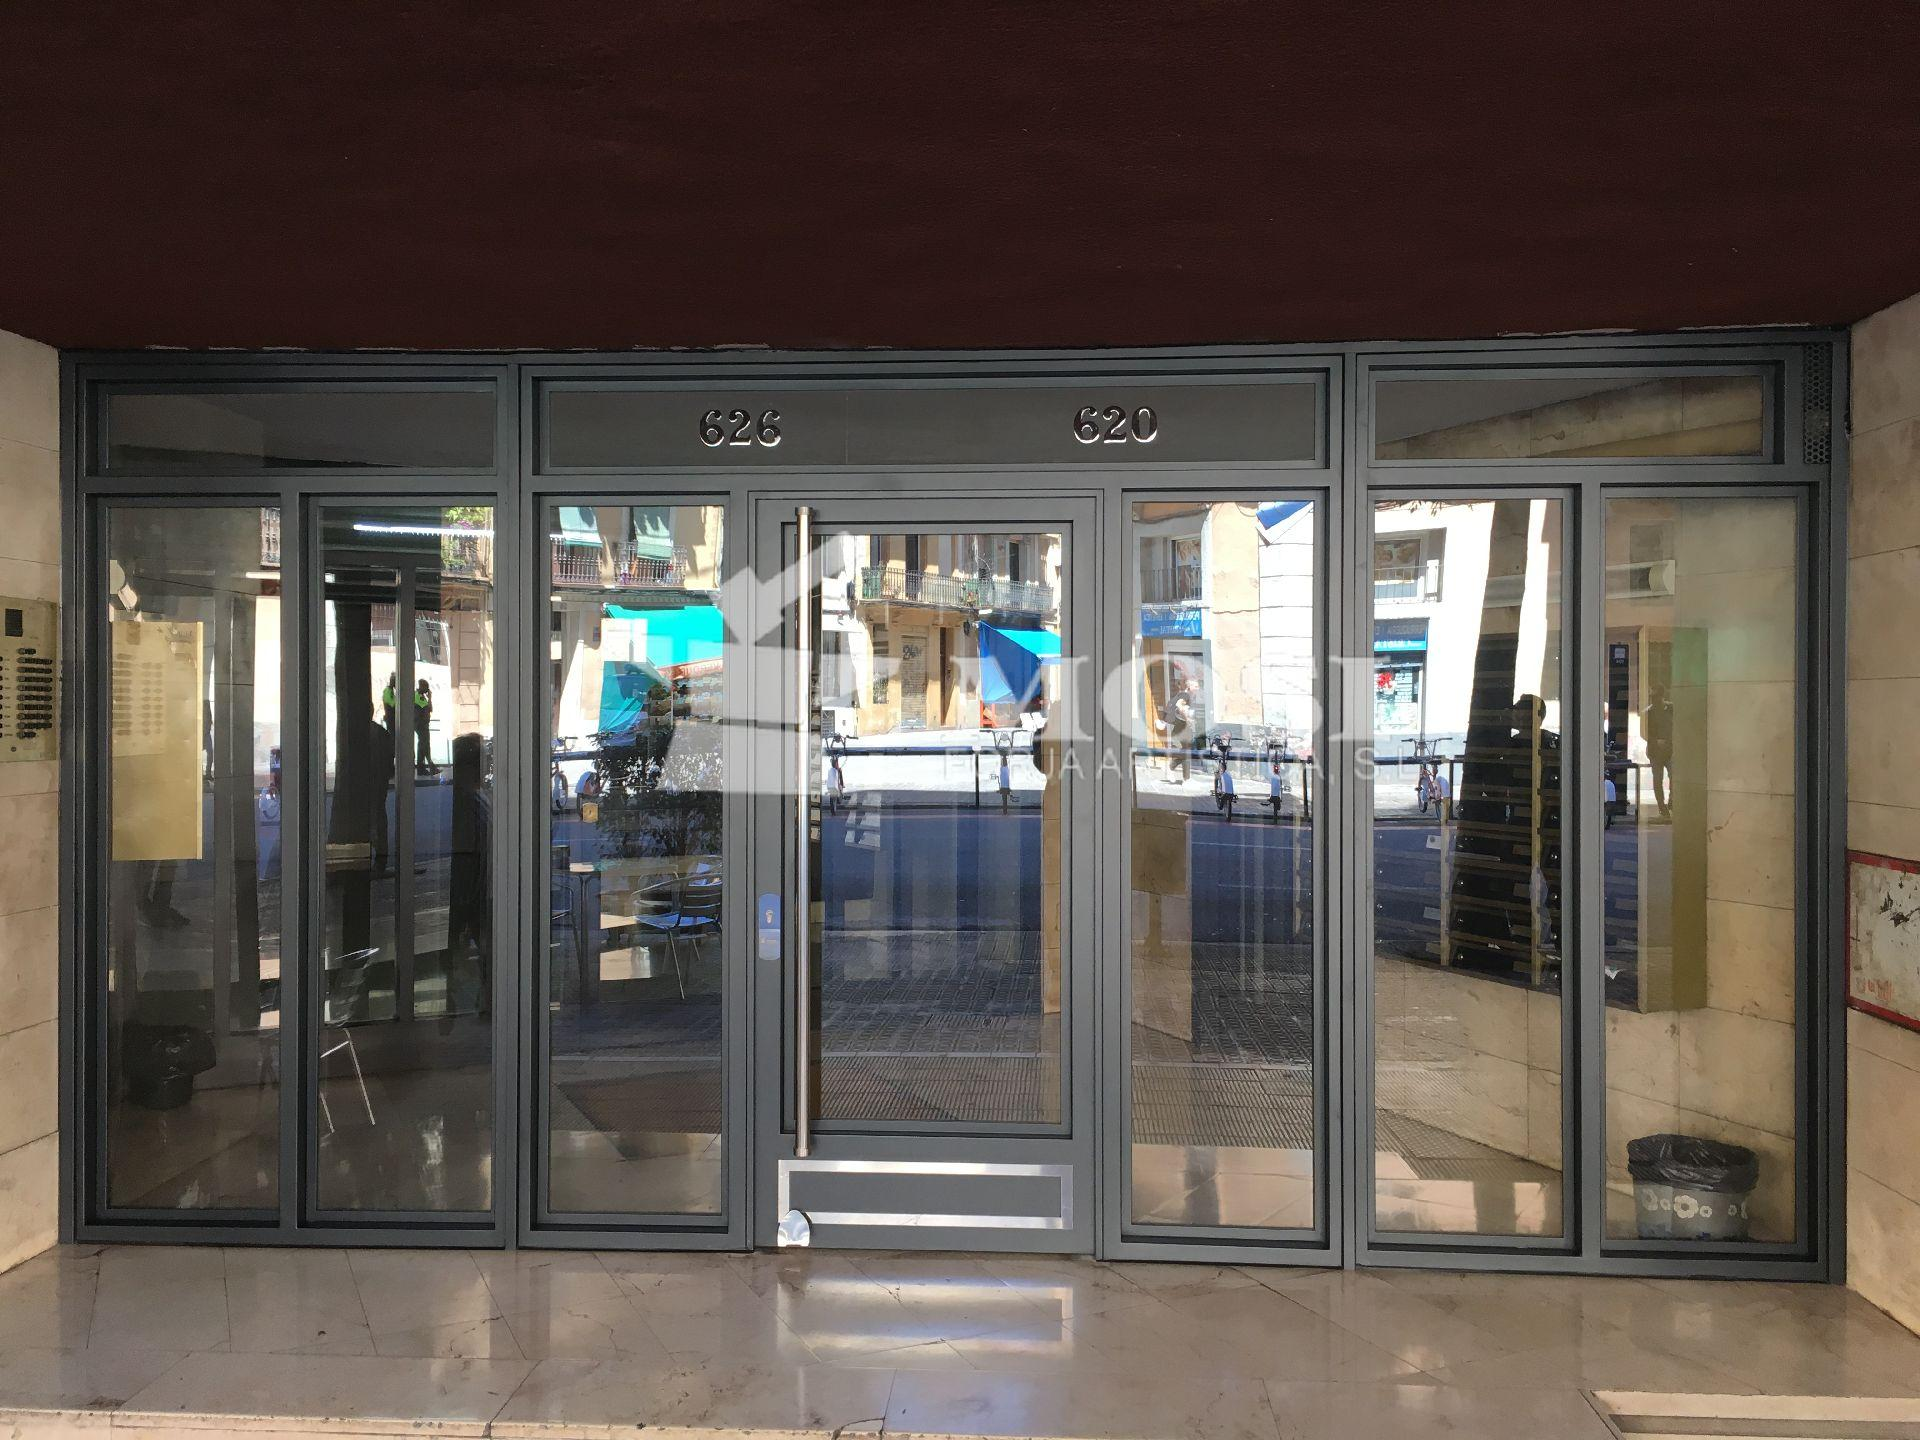 Puerta modelo Sitges